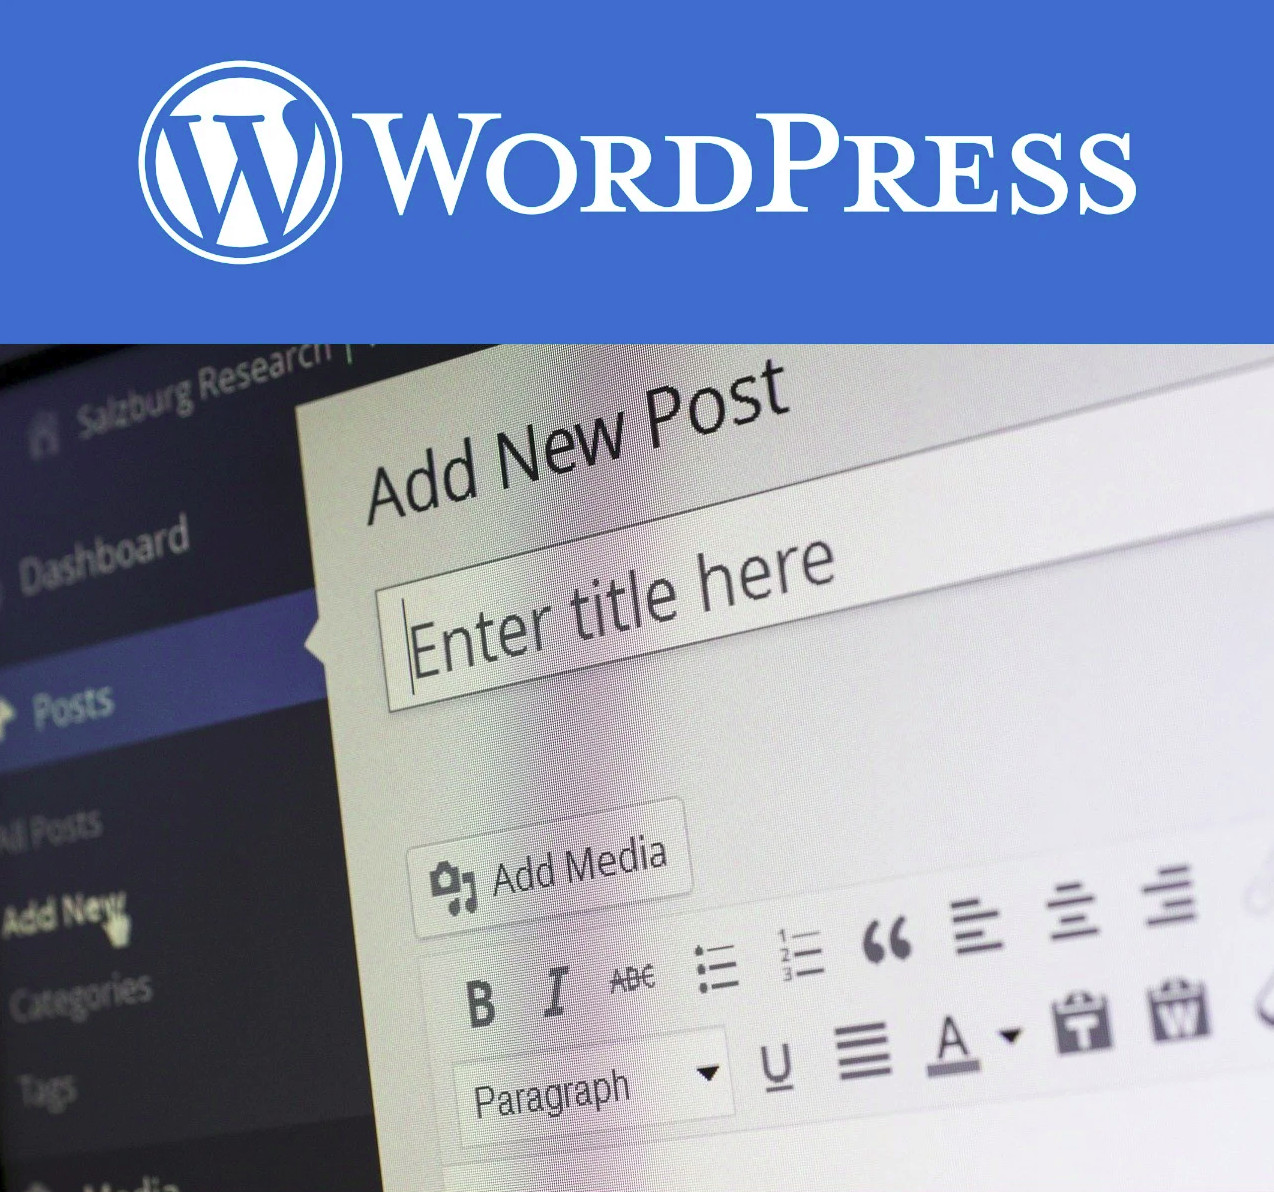 I will install and setup a wordpress website